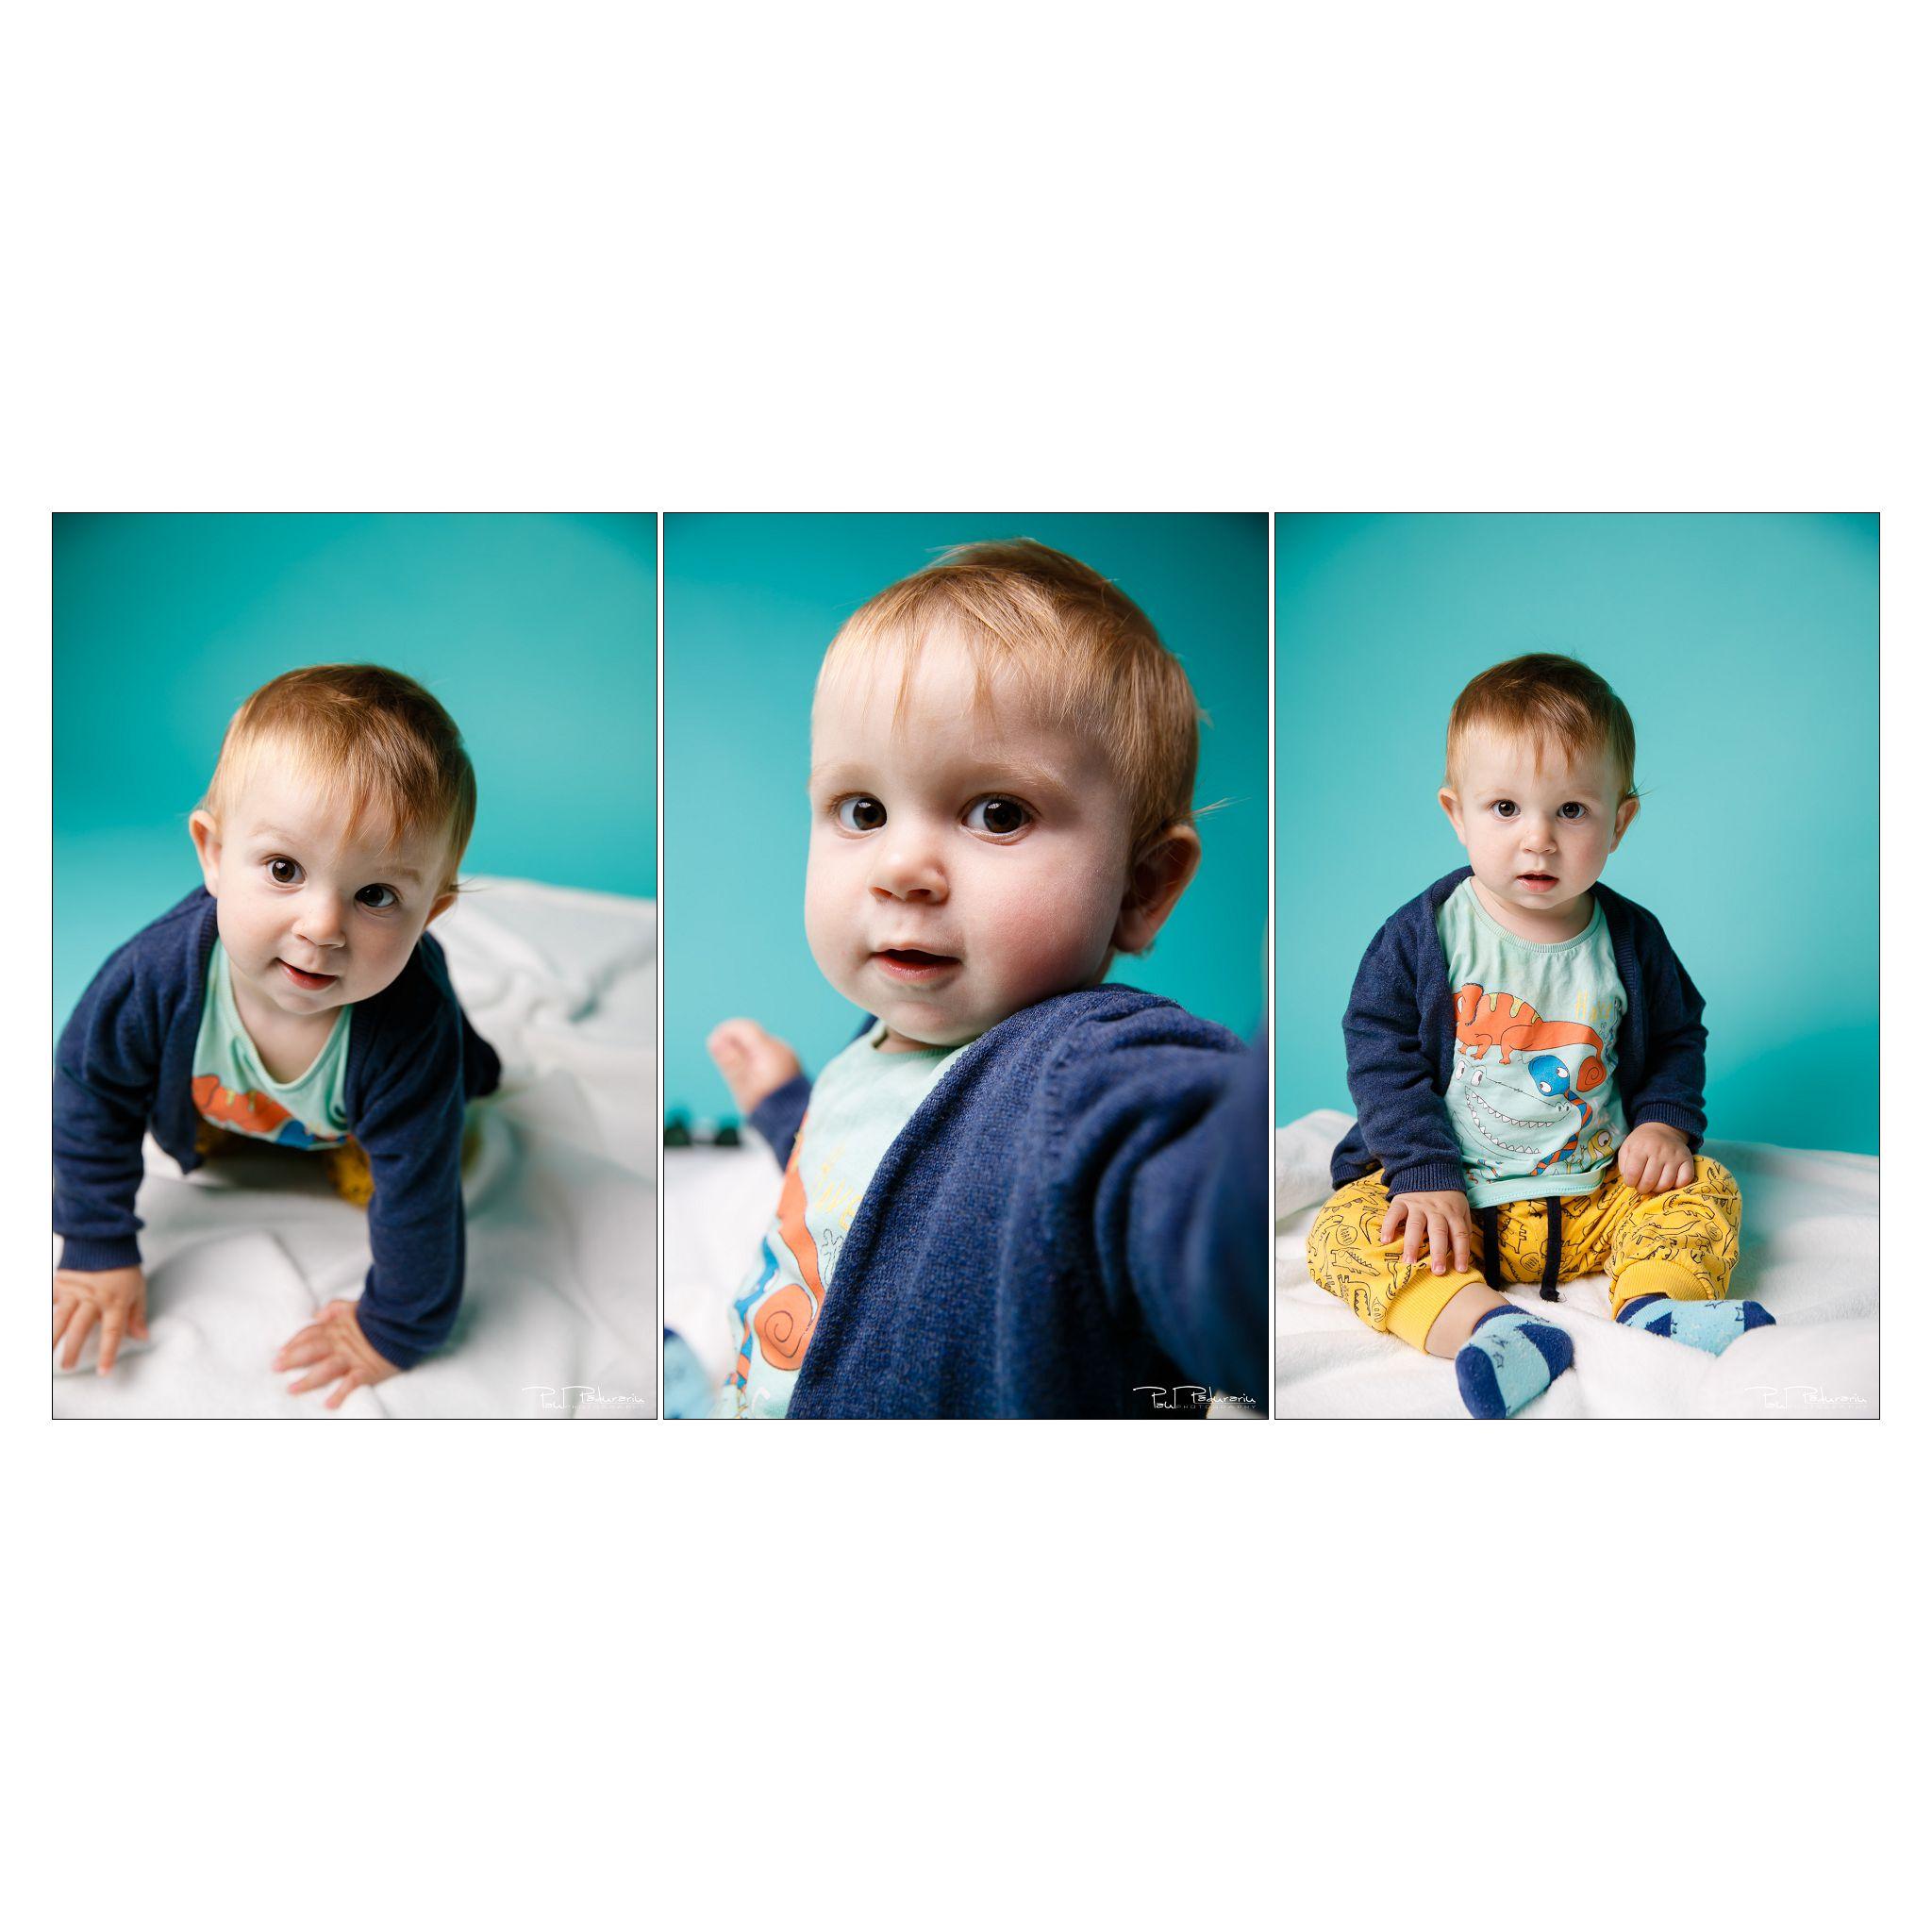 Colaj Sedinta foto pentru copii la Studio Foto Paul Padurariu Iasi - fotograf profesionist